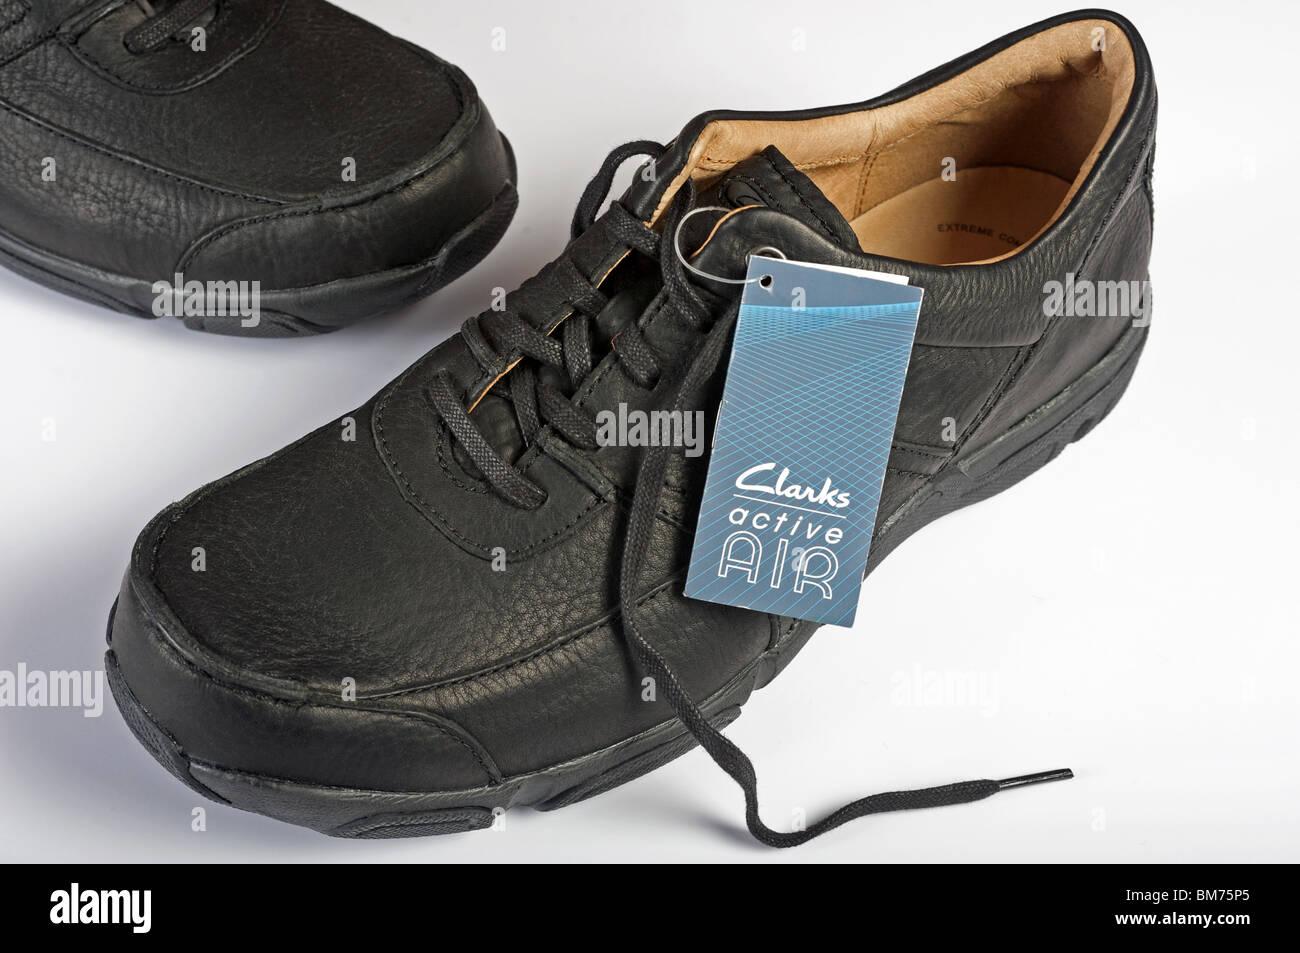 Clarks Schuhe Stockfotos & Clarks Schuhe Bilder Alamy